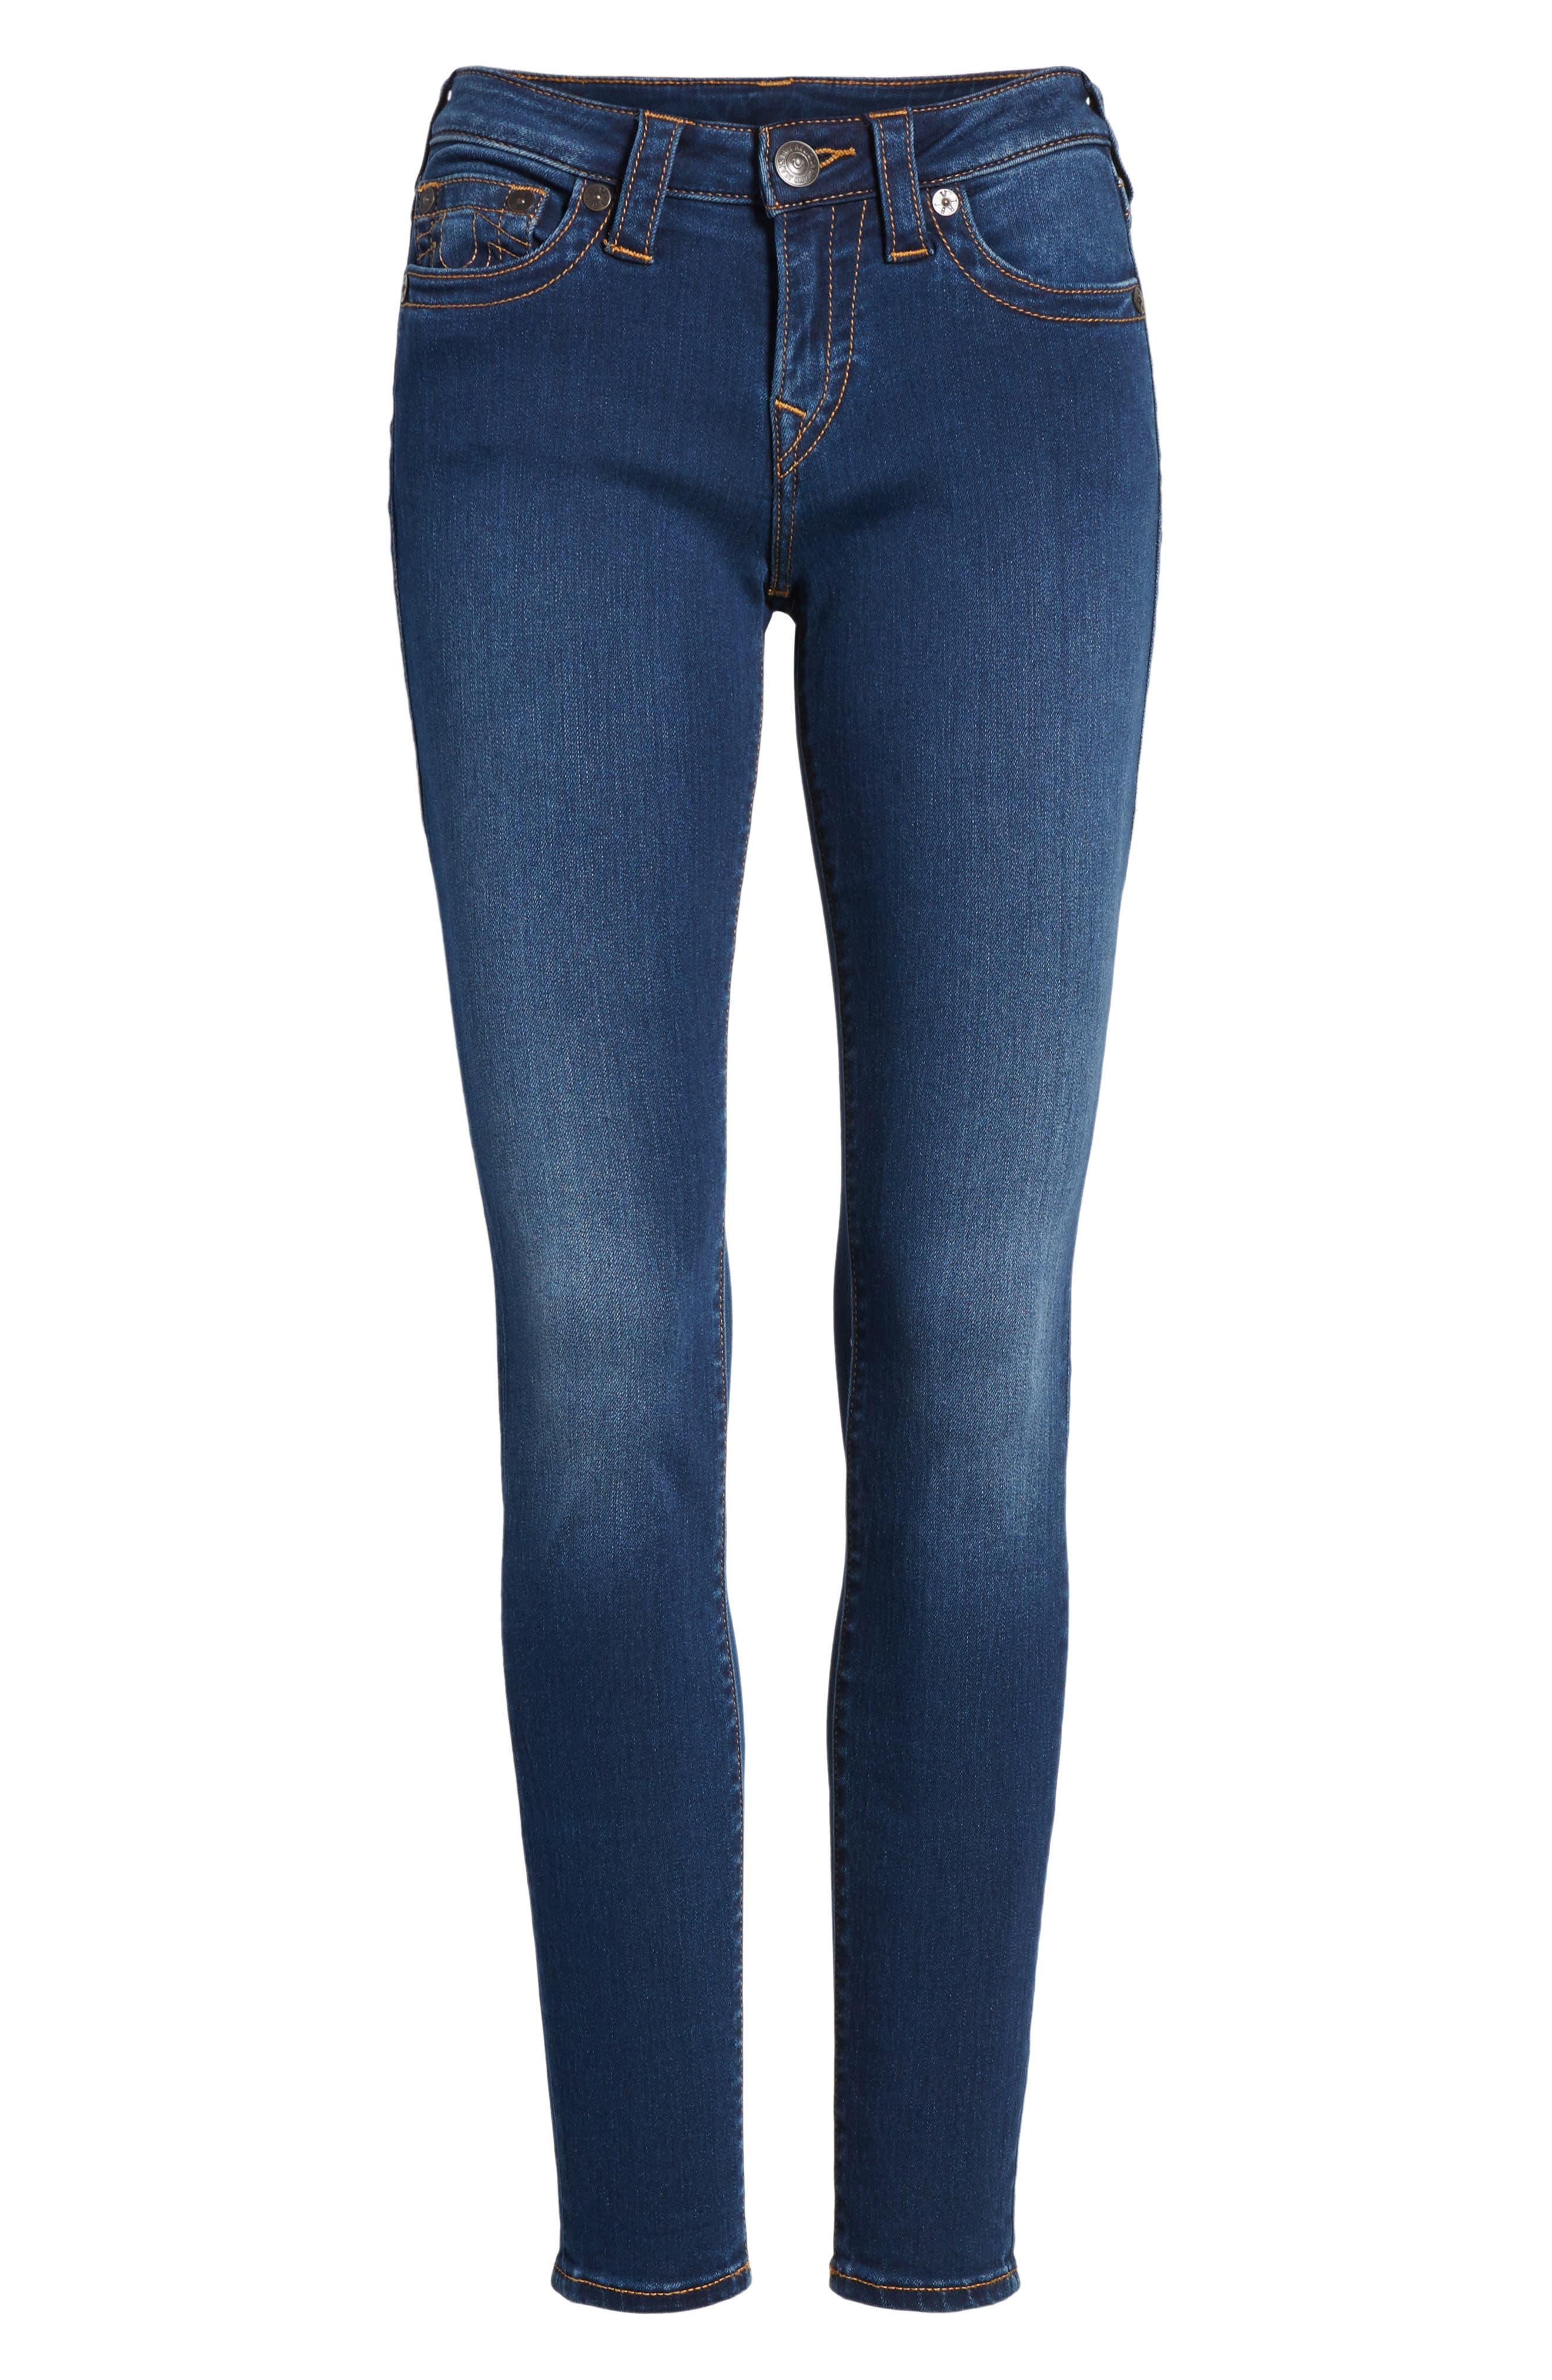 TRUE RELIGION BRAND JEANS,                             Halle Mid Rise Skinny Jeans,                             Alternate thumbnail 6, color,                             400